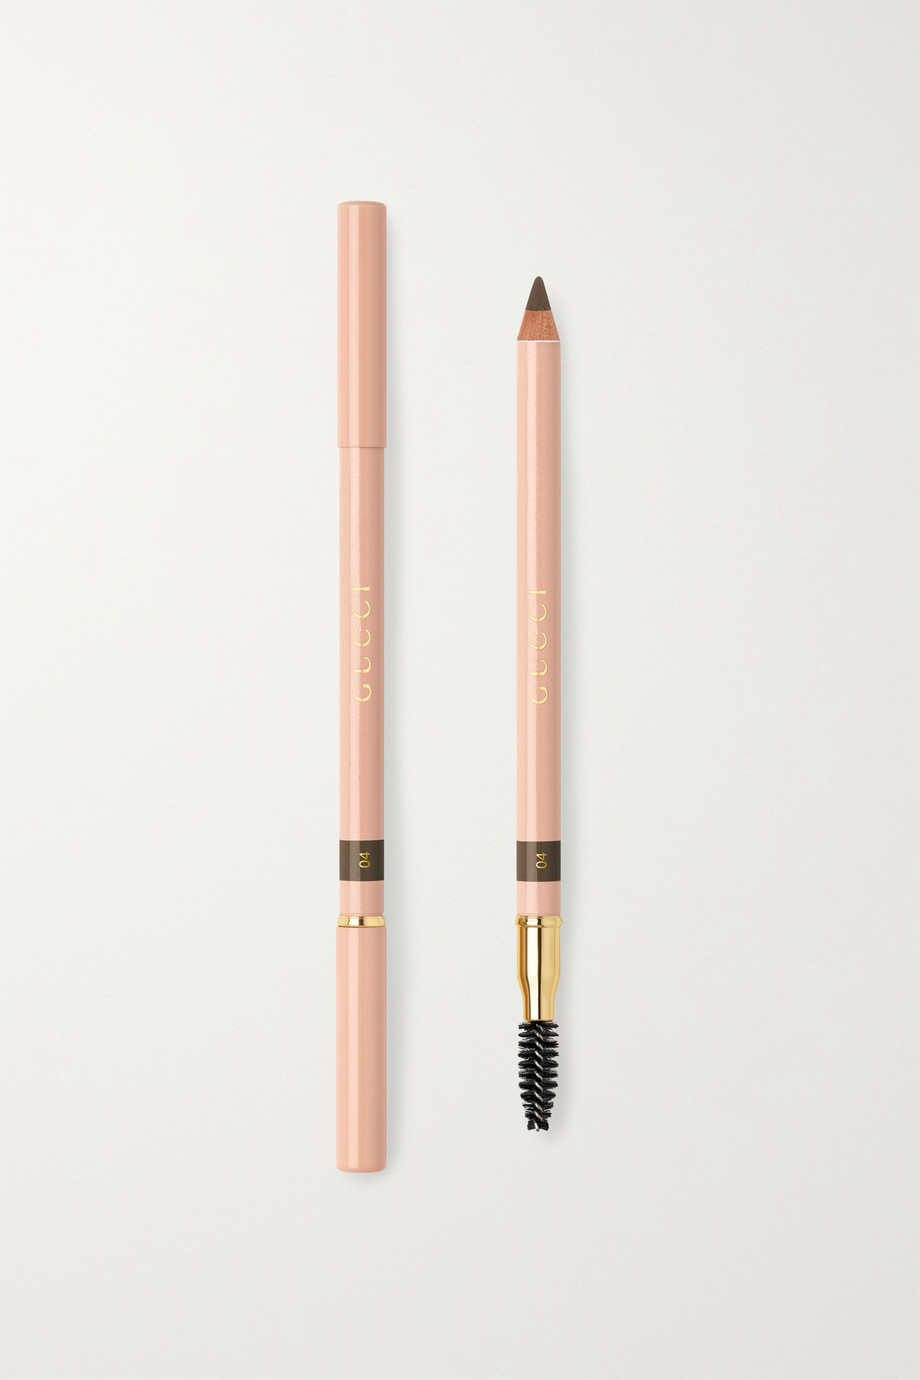 Gucci Beauty Powder Eyebrow Pencil - Dark Brown